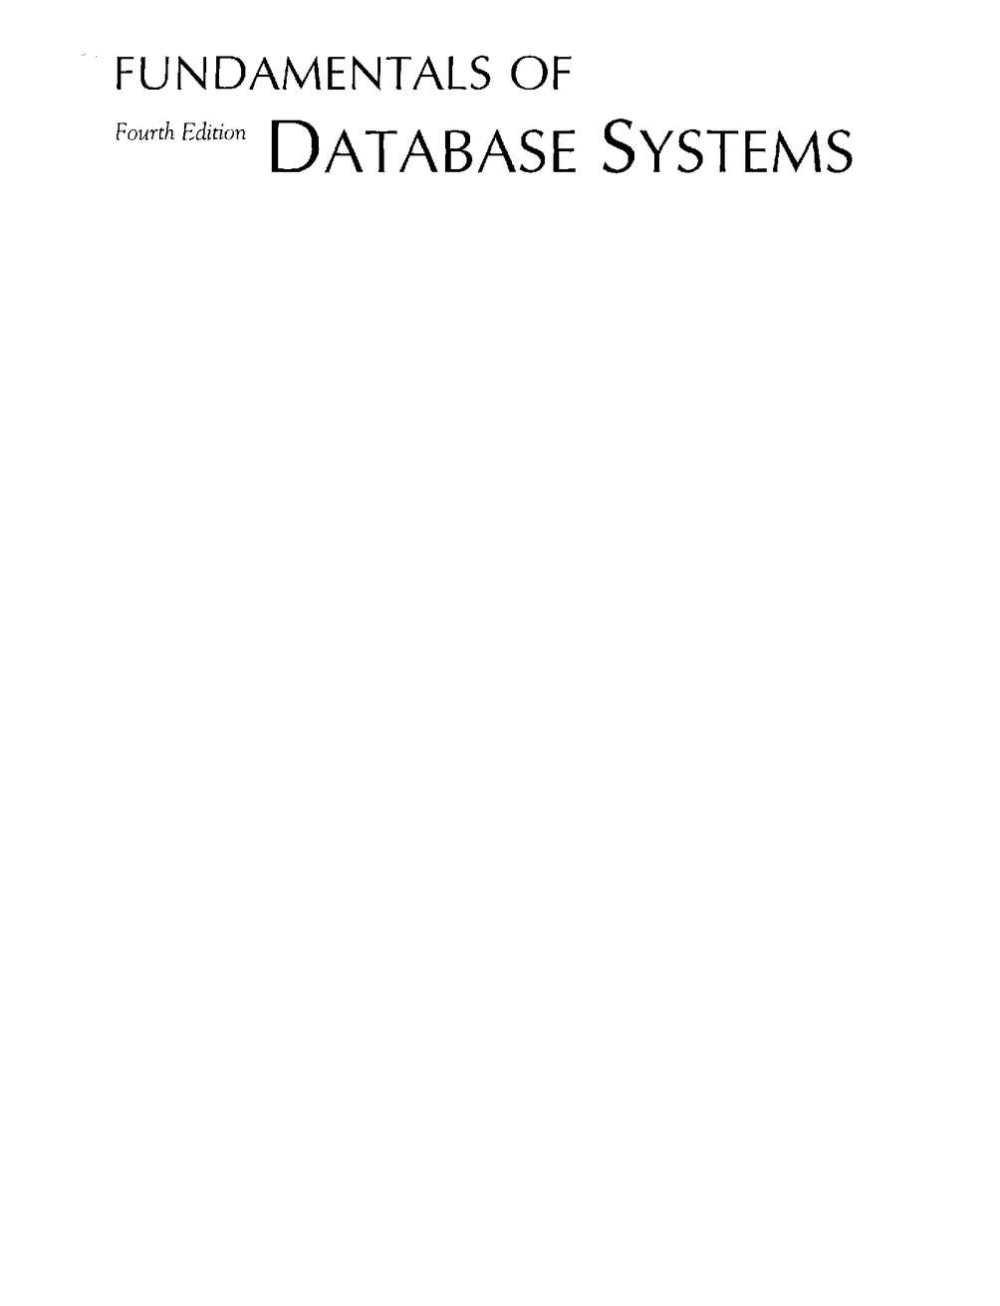 medium resolution of fundamentals of database systems 4th edition